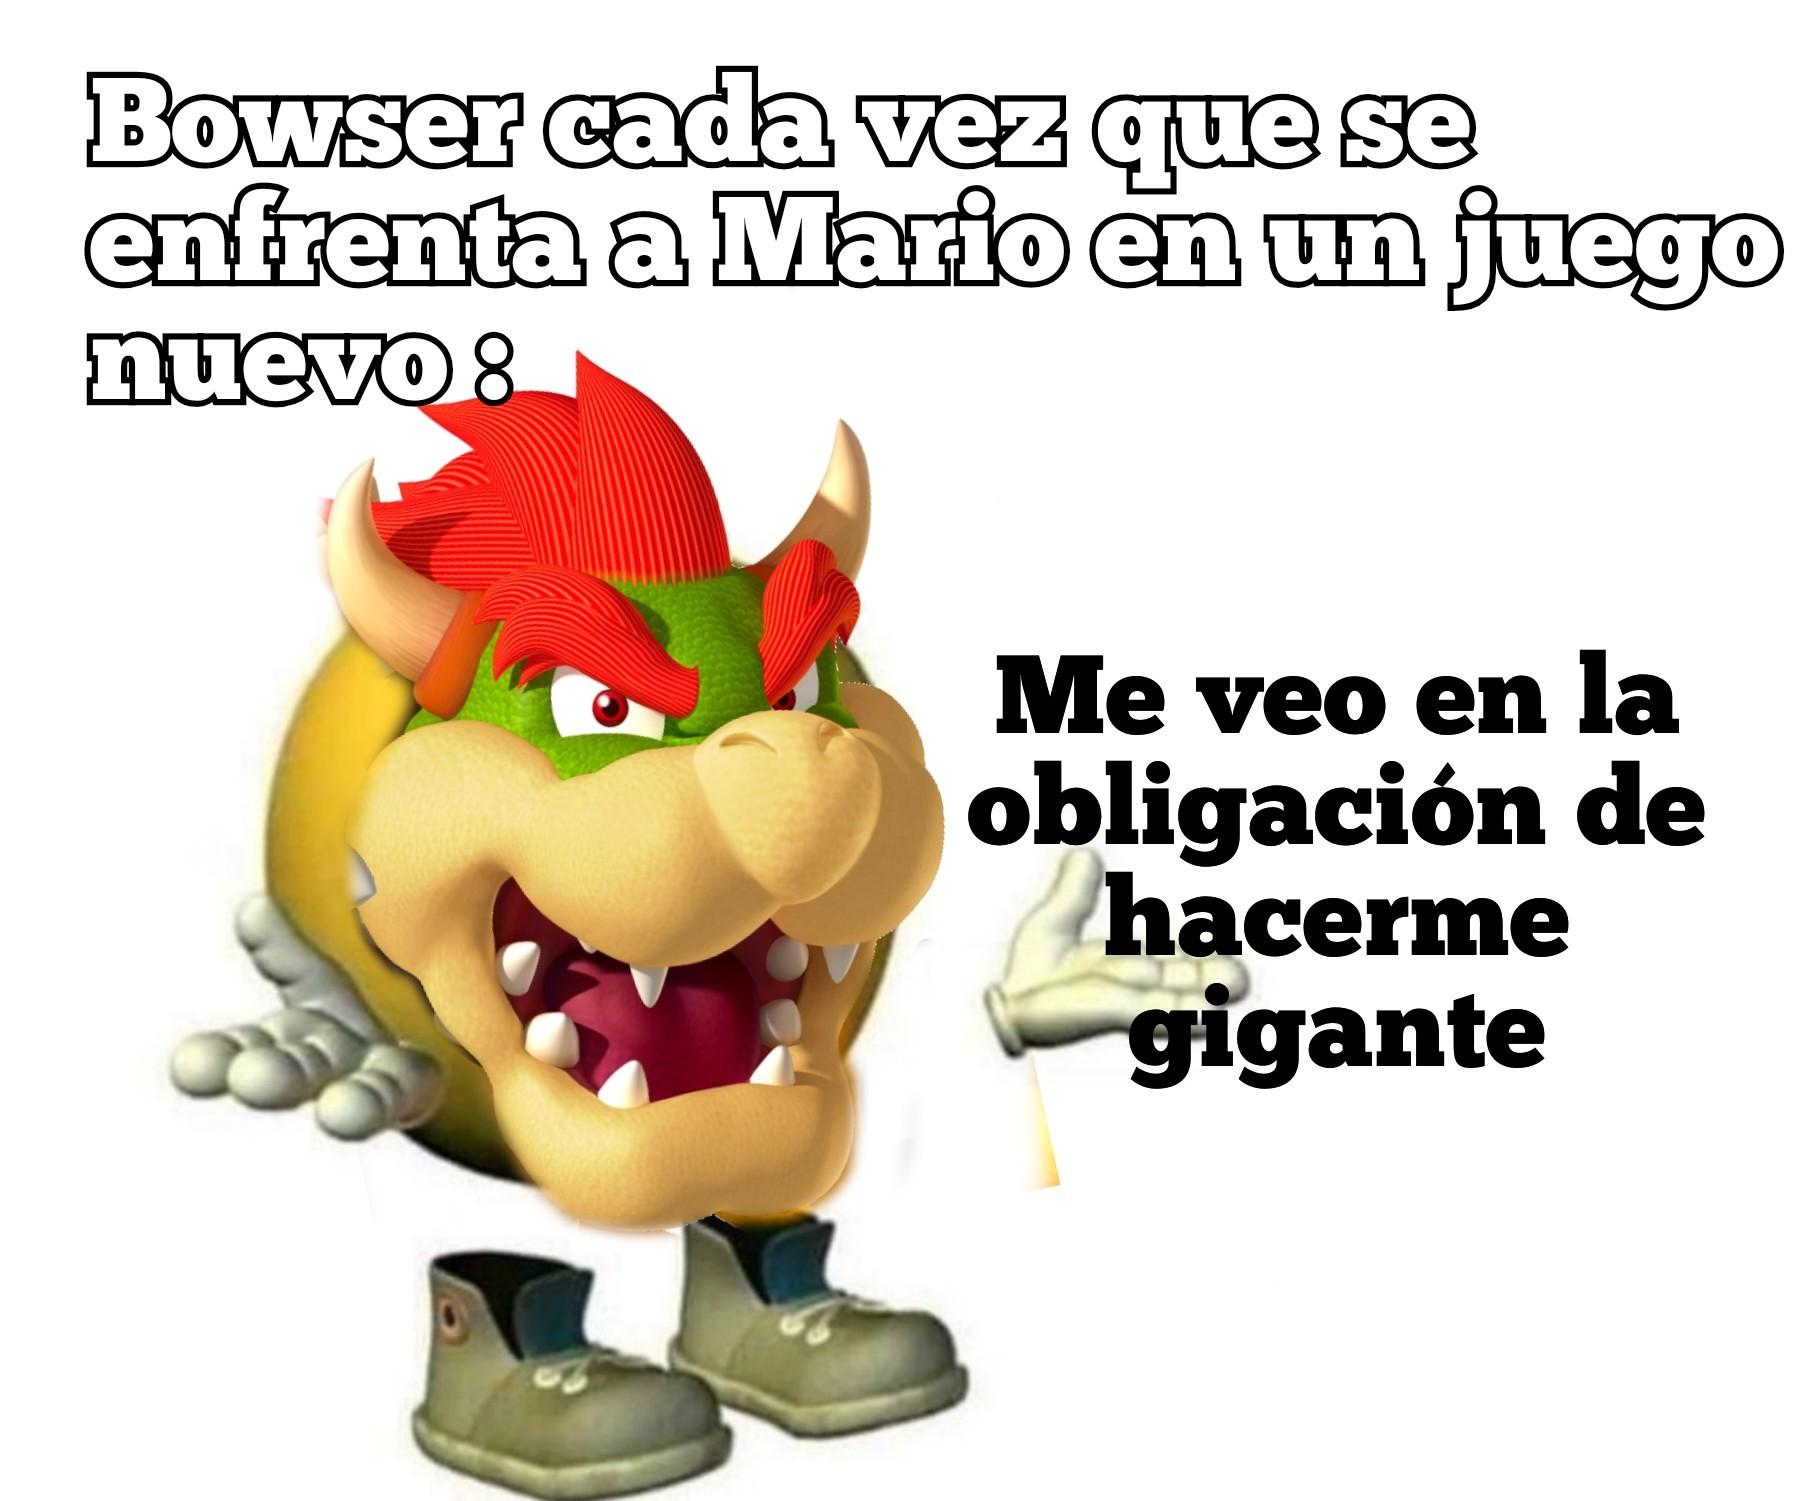 Bowser gijante - meme